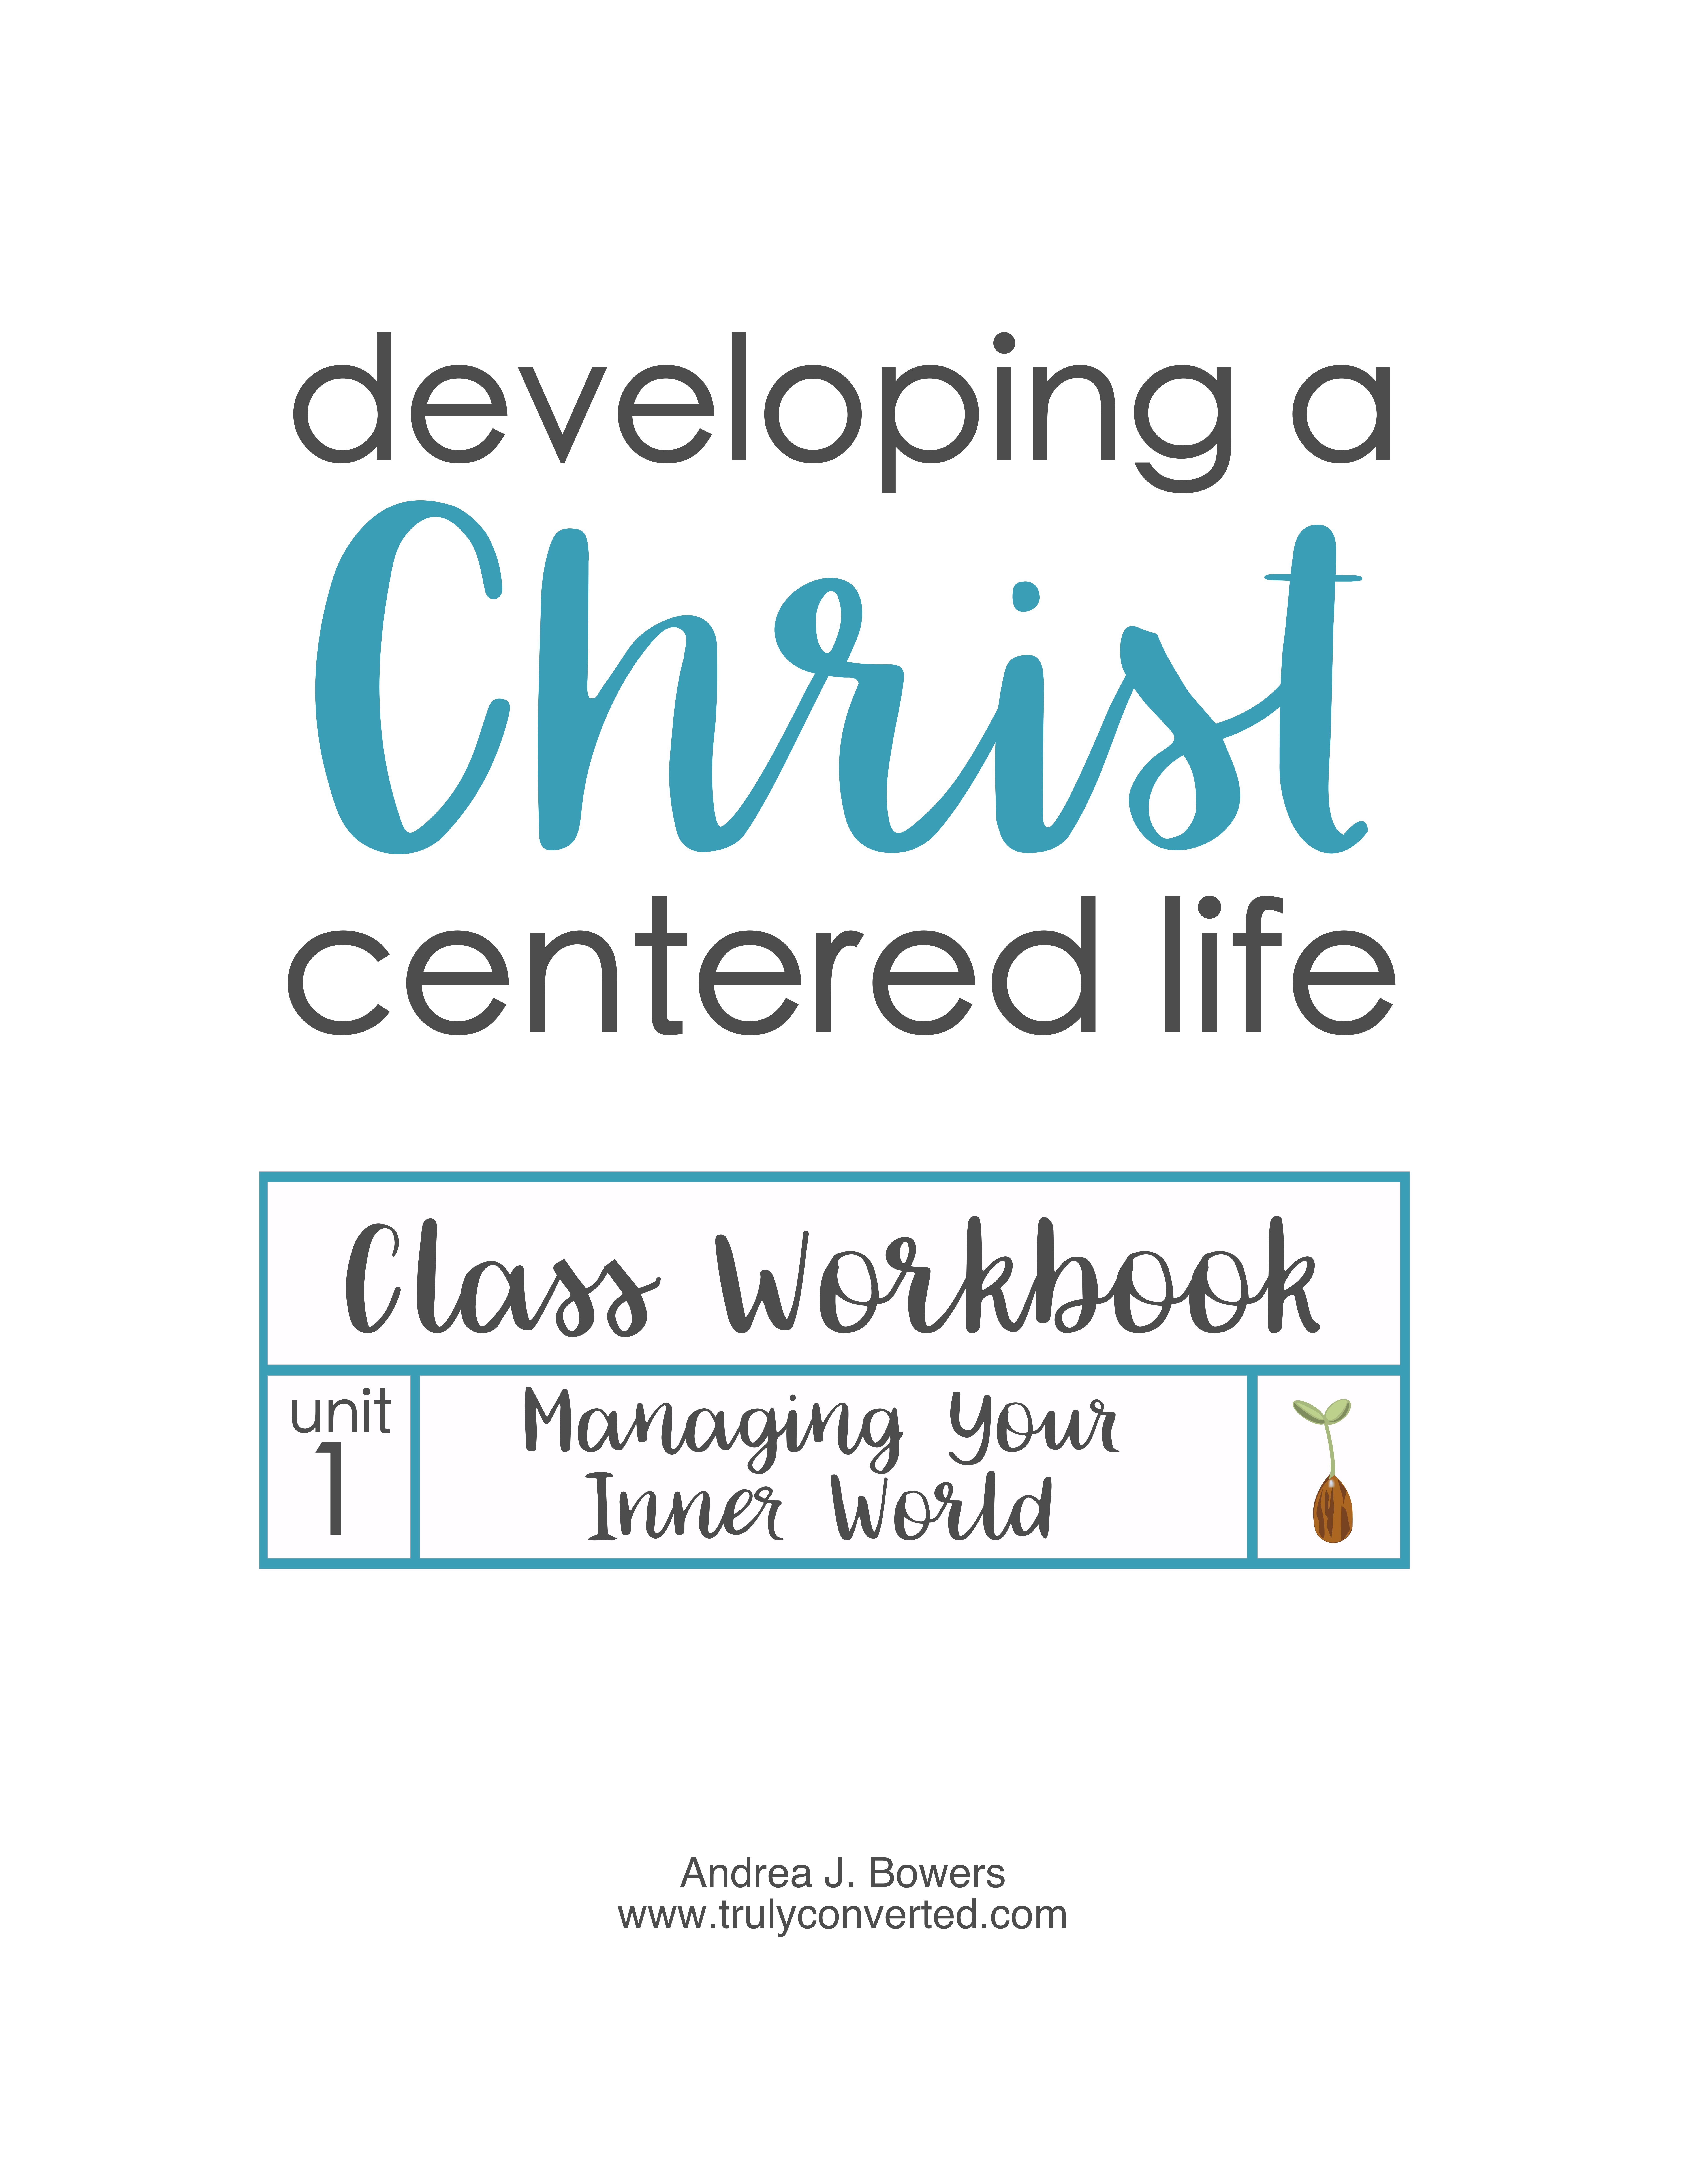 Class workbook cover.